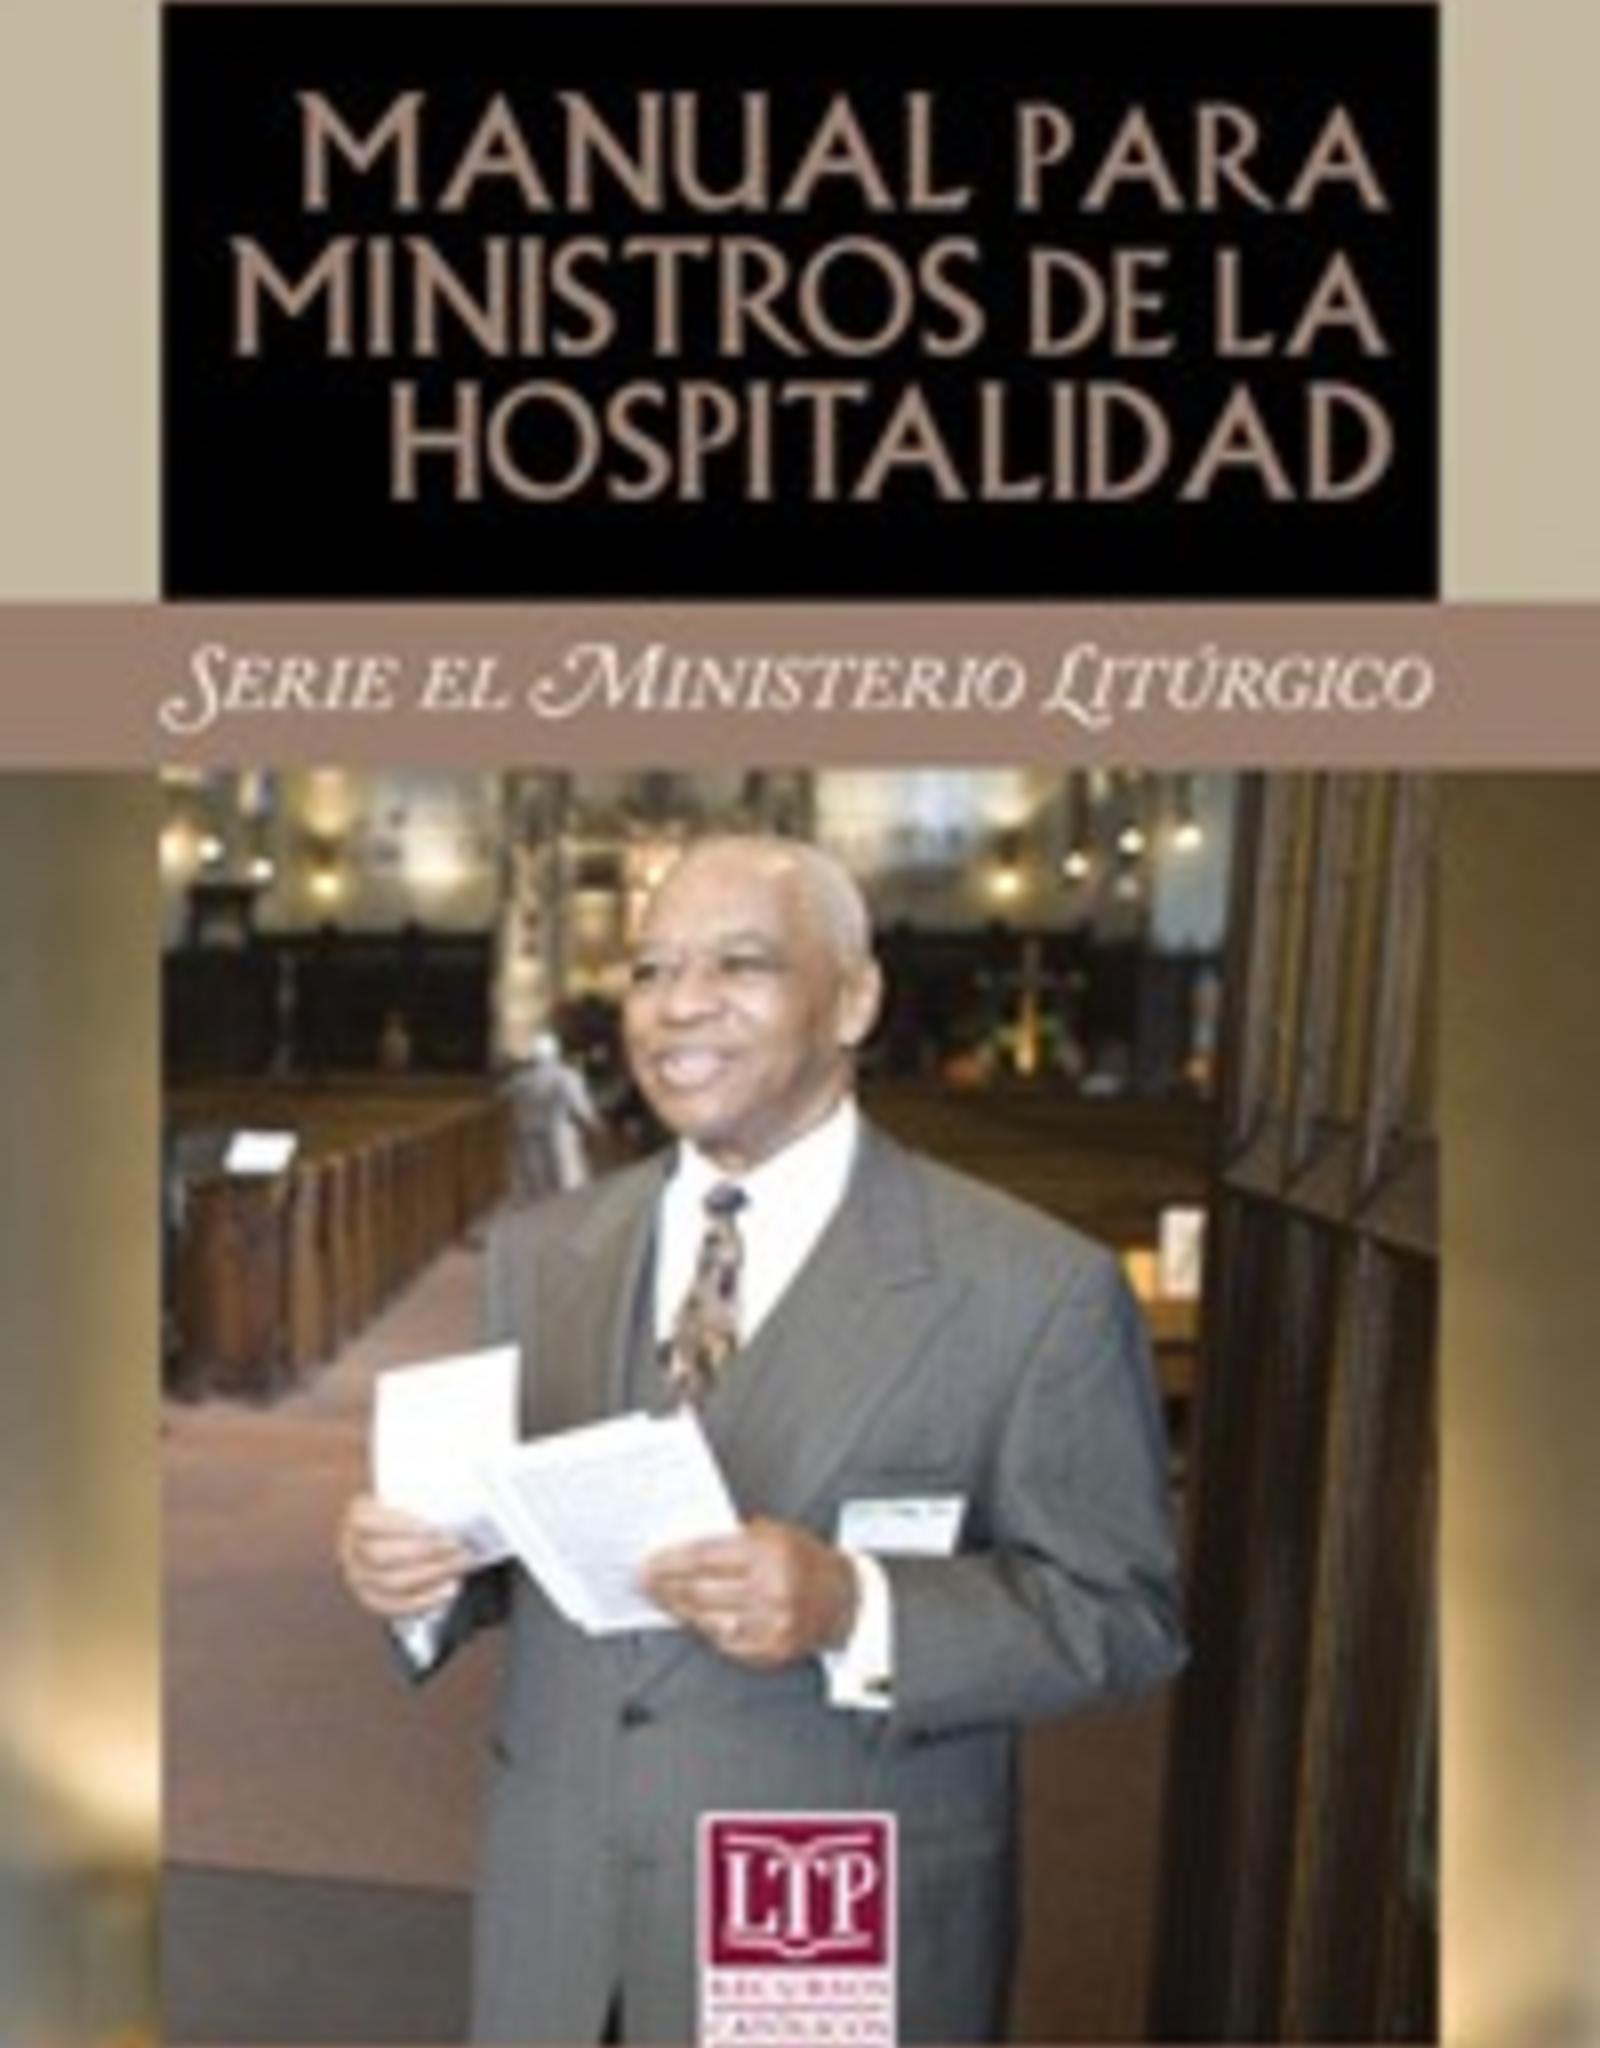 Liturgical Training Press Manual para ministros de la hospitalidad, Paul Turner and Karie Ferrell